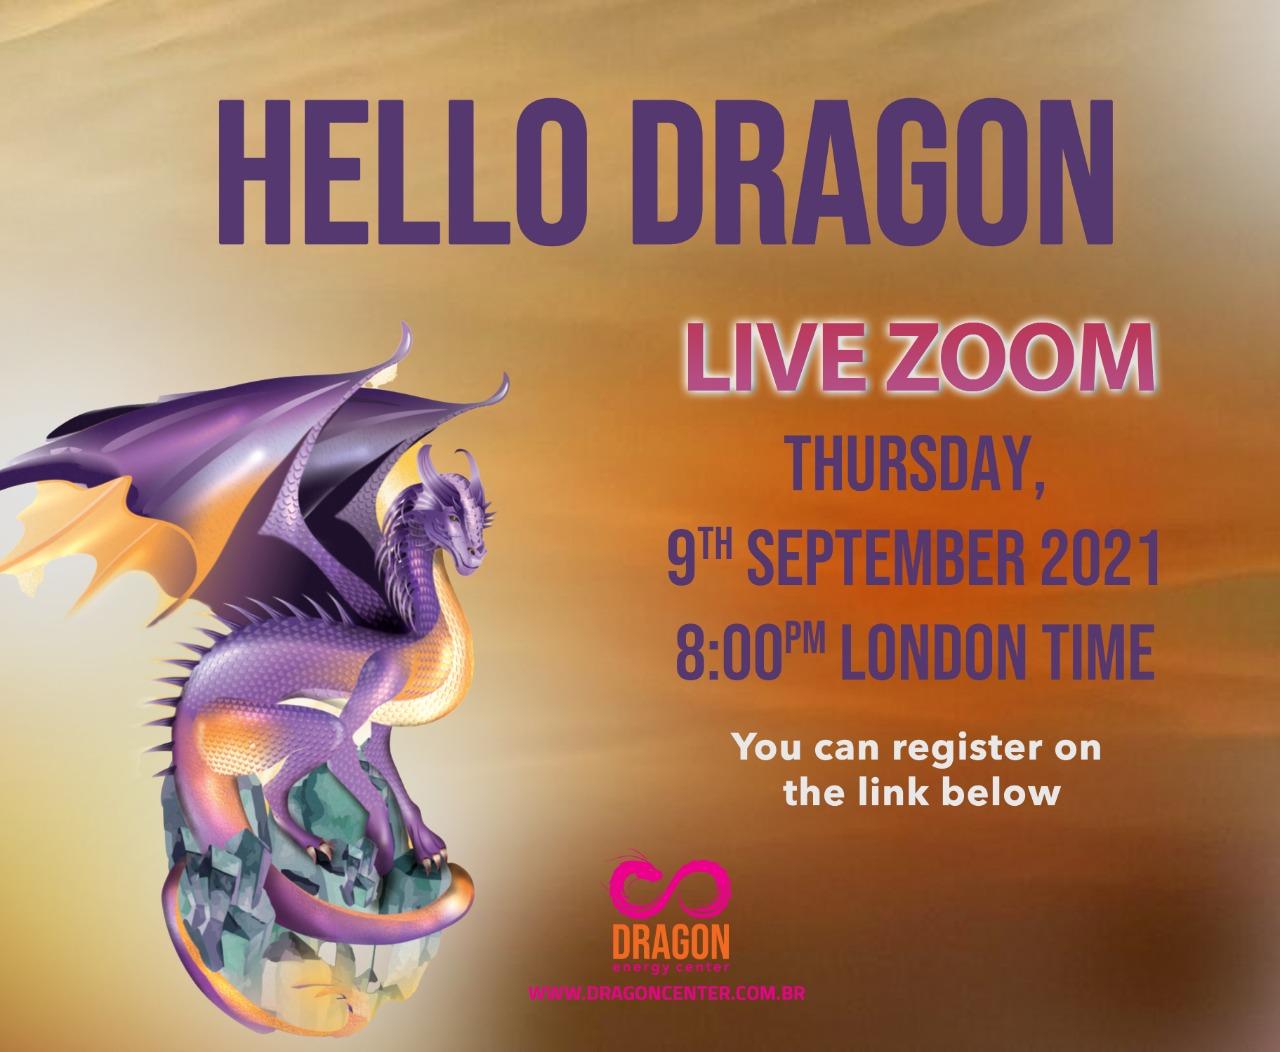 9th September, 2021, 8pm London Time